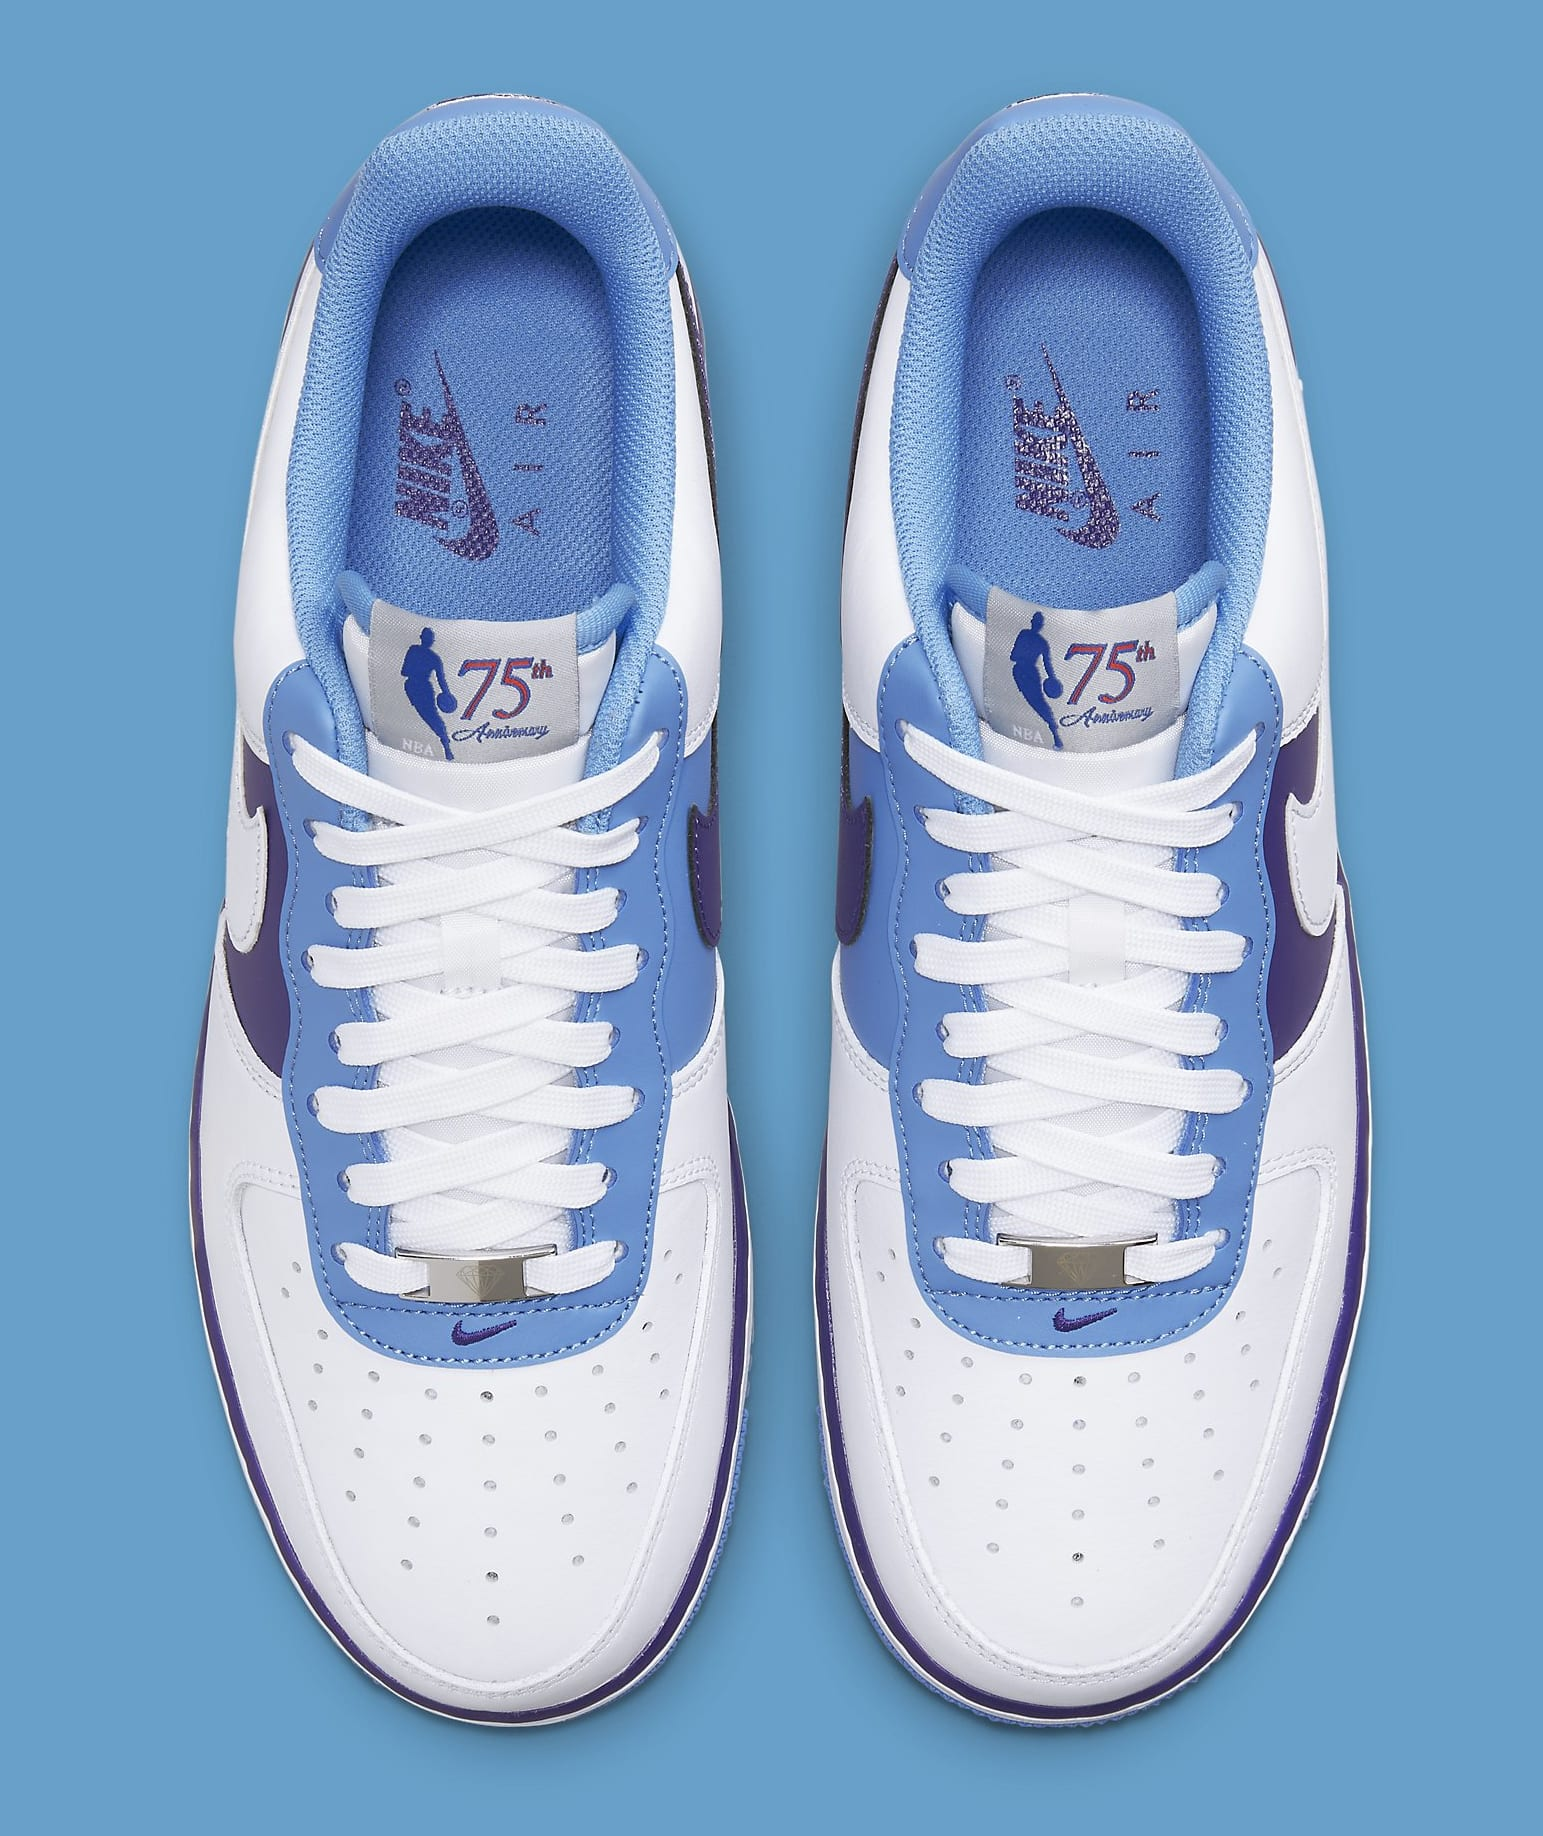 Nike Air Force 1 Low 'Lakers' NBA 75th Anniversary DC8874-101 Top